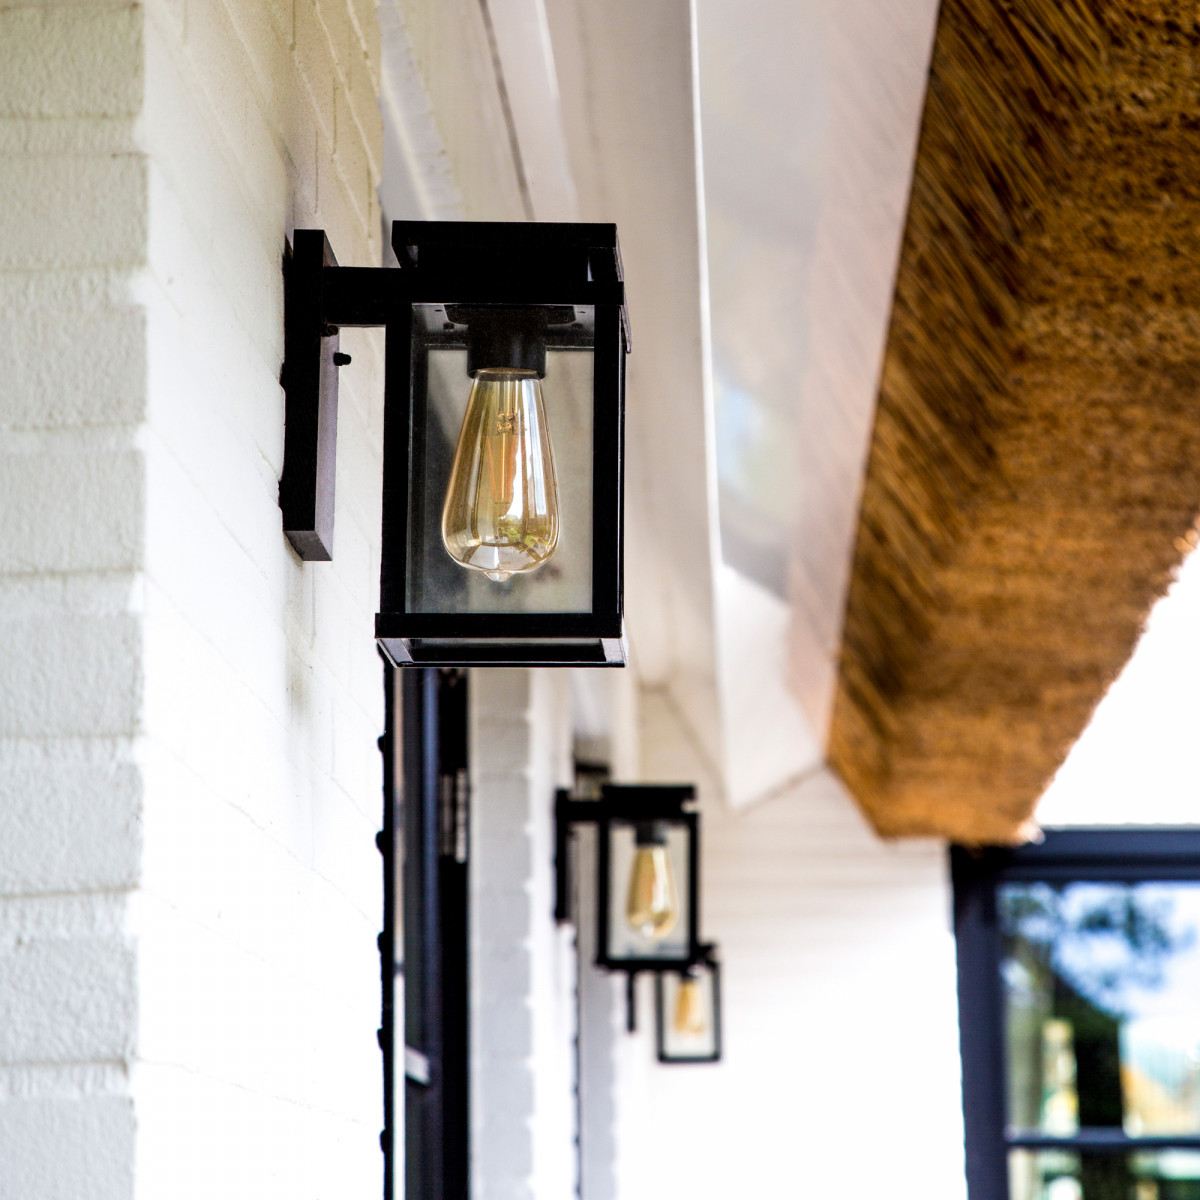 Buitenlamp Jersey Medium (7353) mat zwart - KS Verlichting